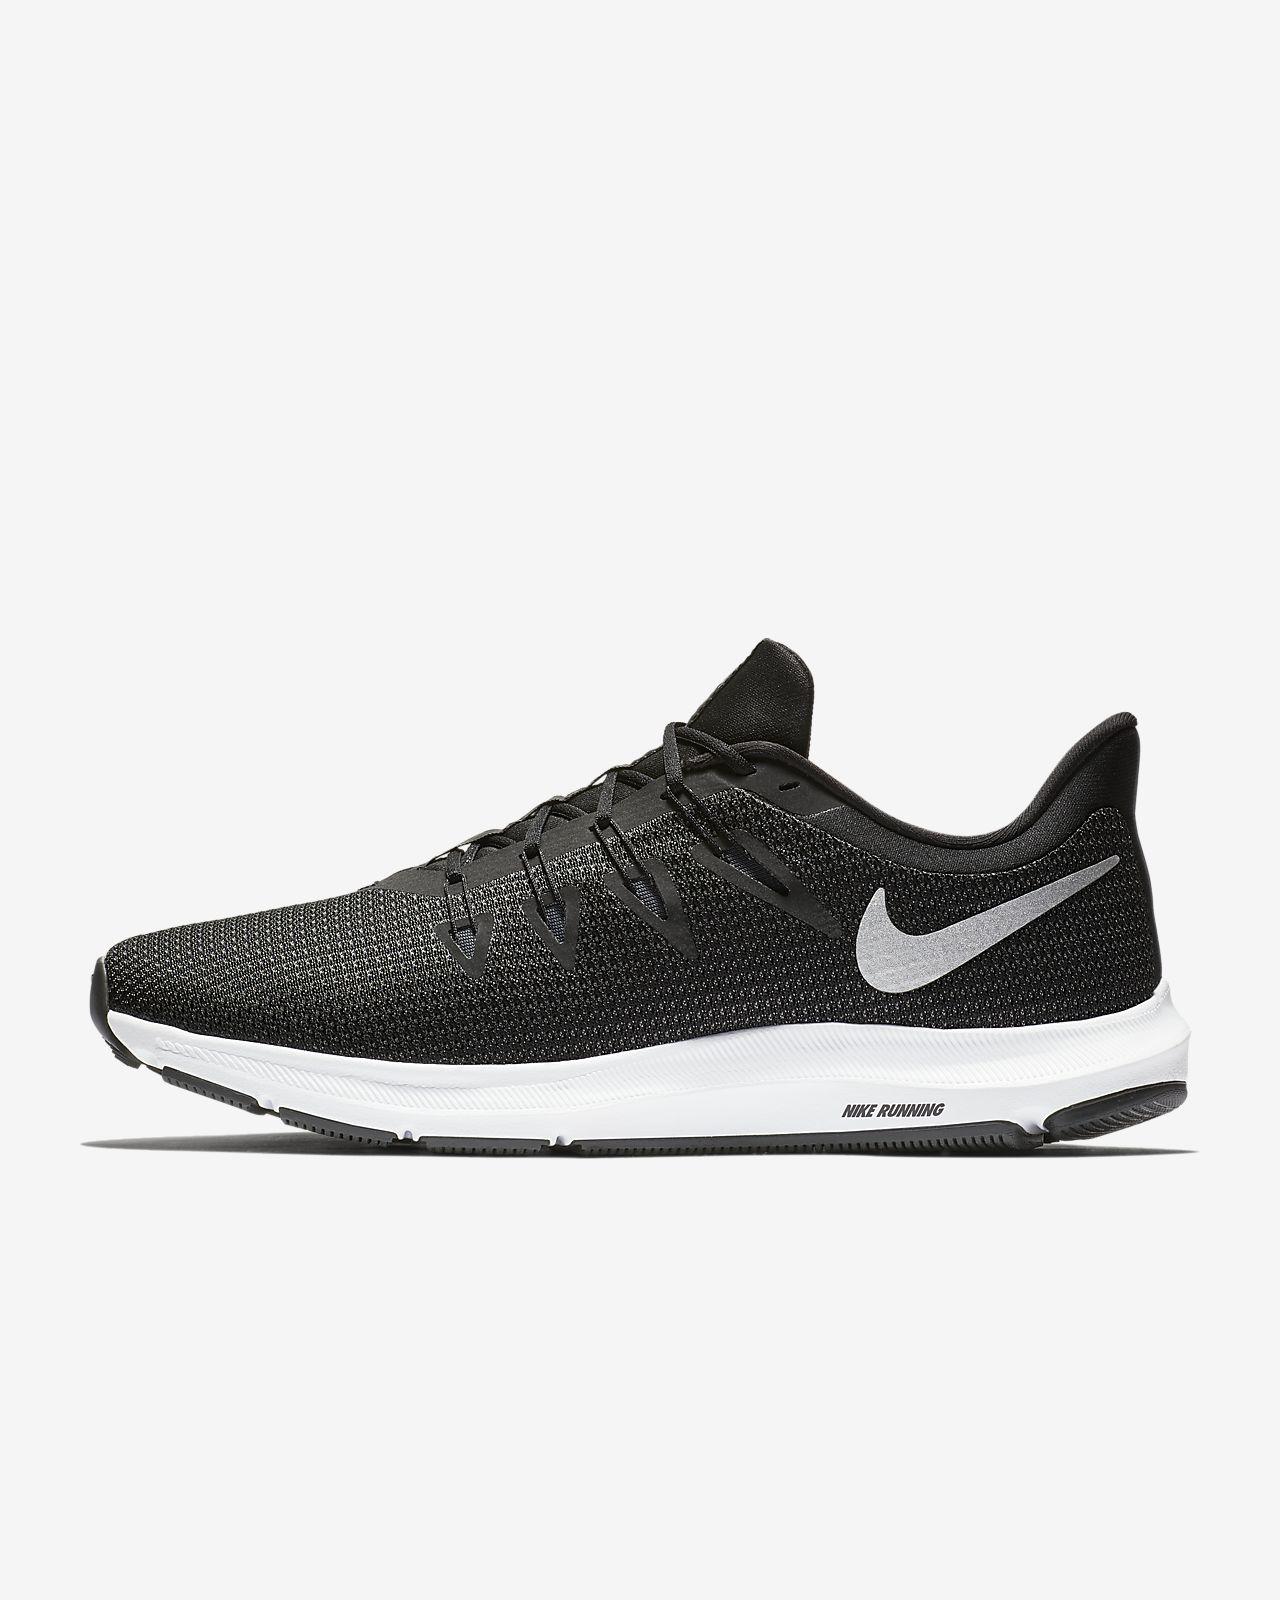 ae16d9ac4c0 Chaussure de running Nike Quest pour Homme. Nike.com FR